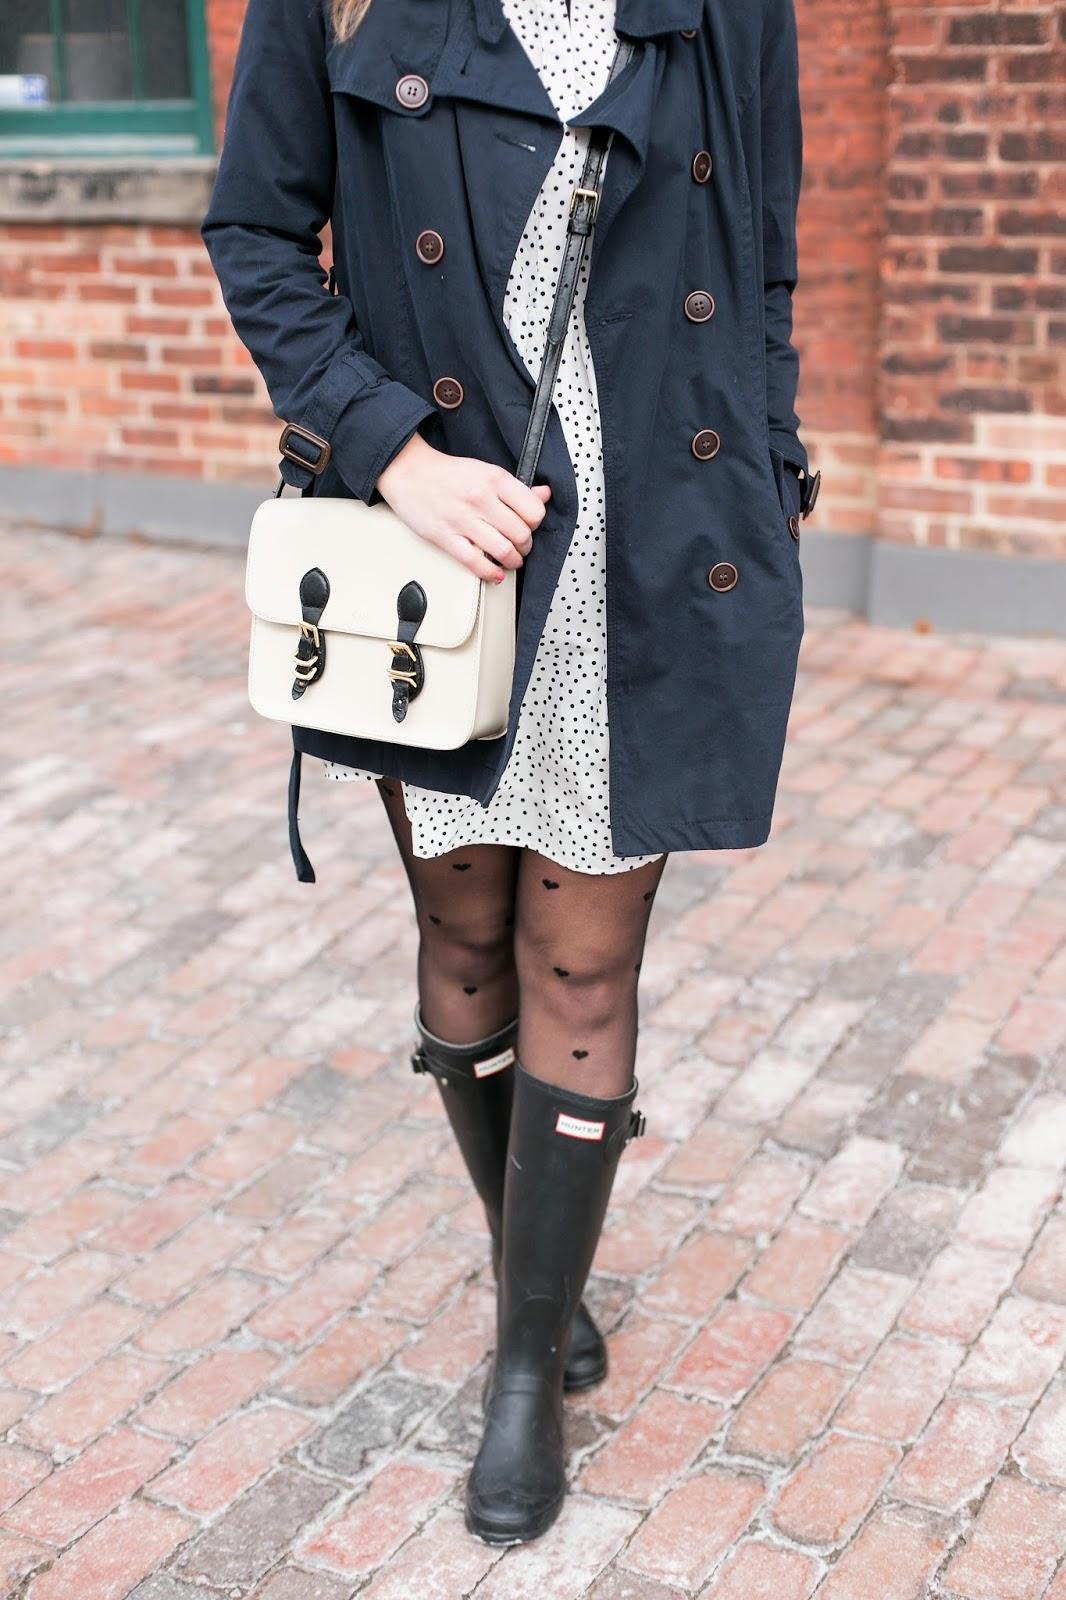 Bijuleni - 4 Spring Essentials, Navy Raincoat, Polka Dot dress, messenger satchel, Hunter books look.